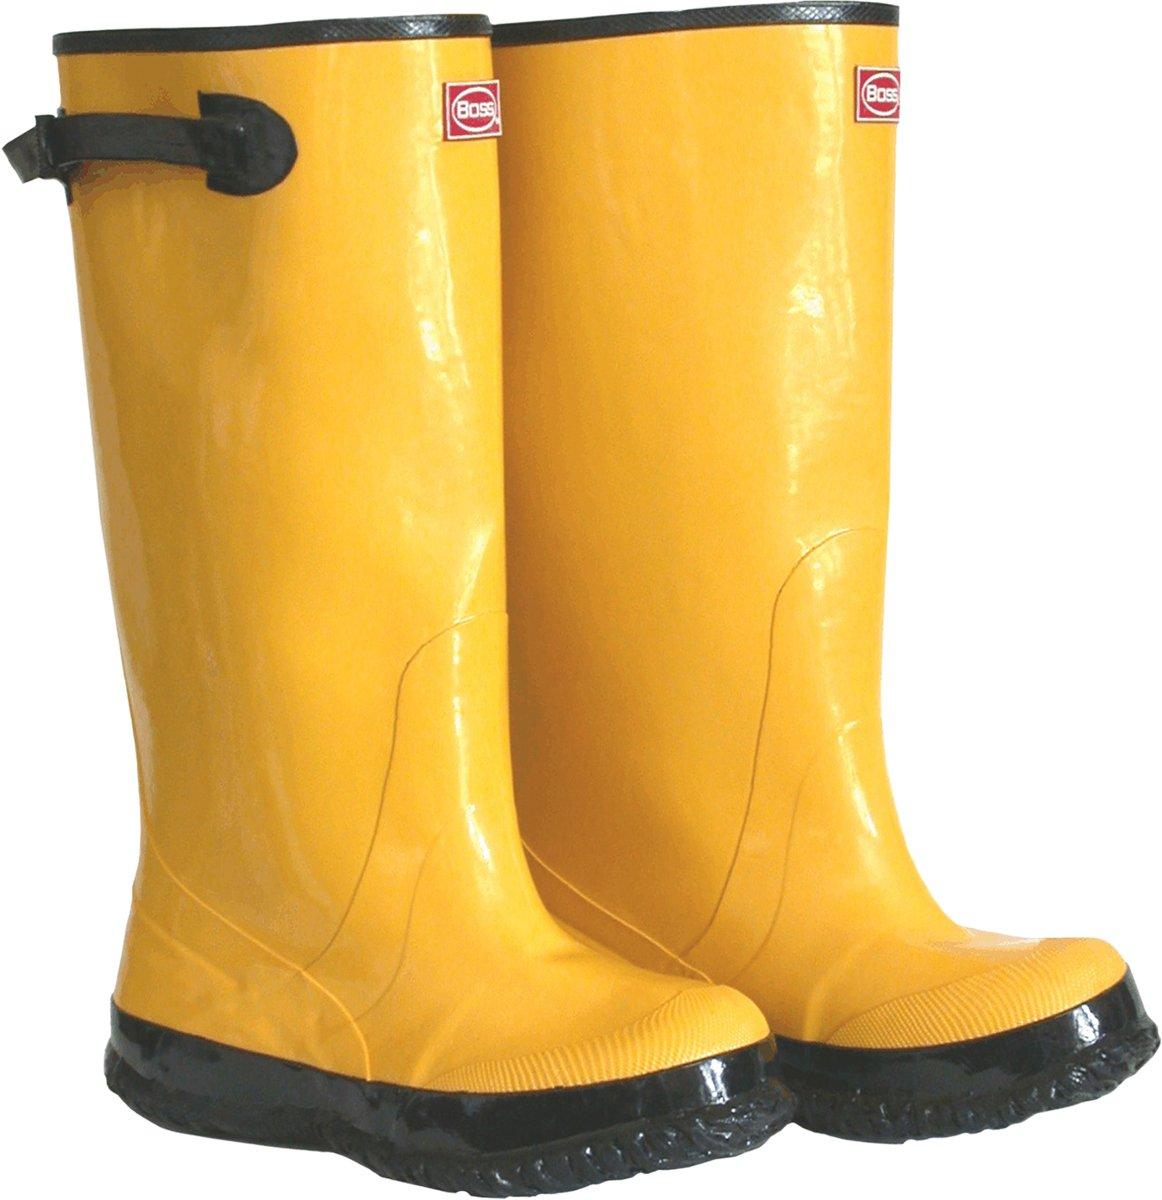 Boss Gloves Mens Yellow Rubber Boots